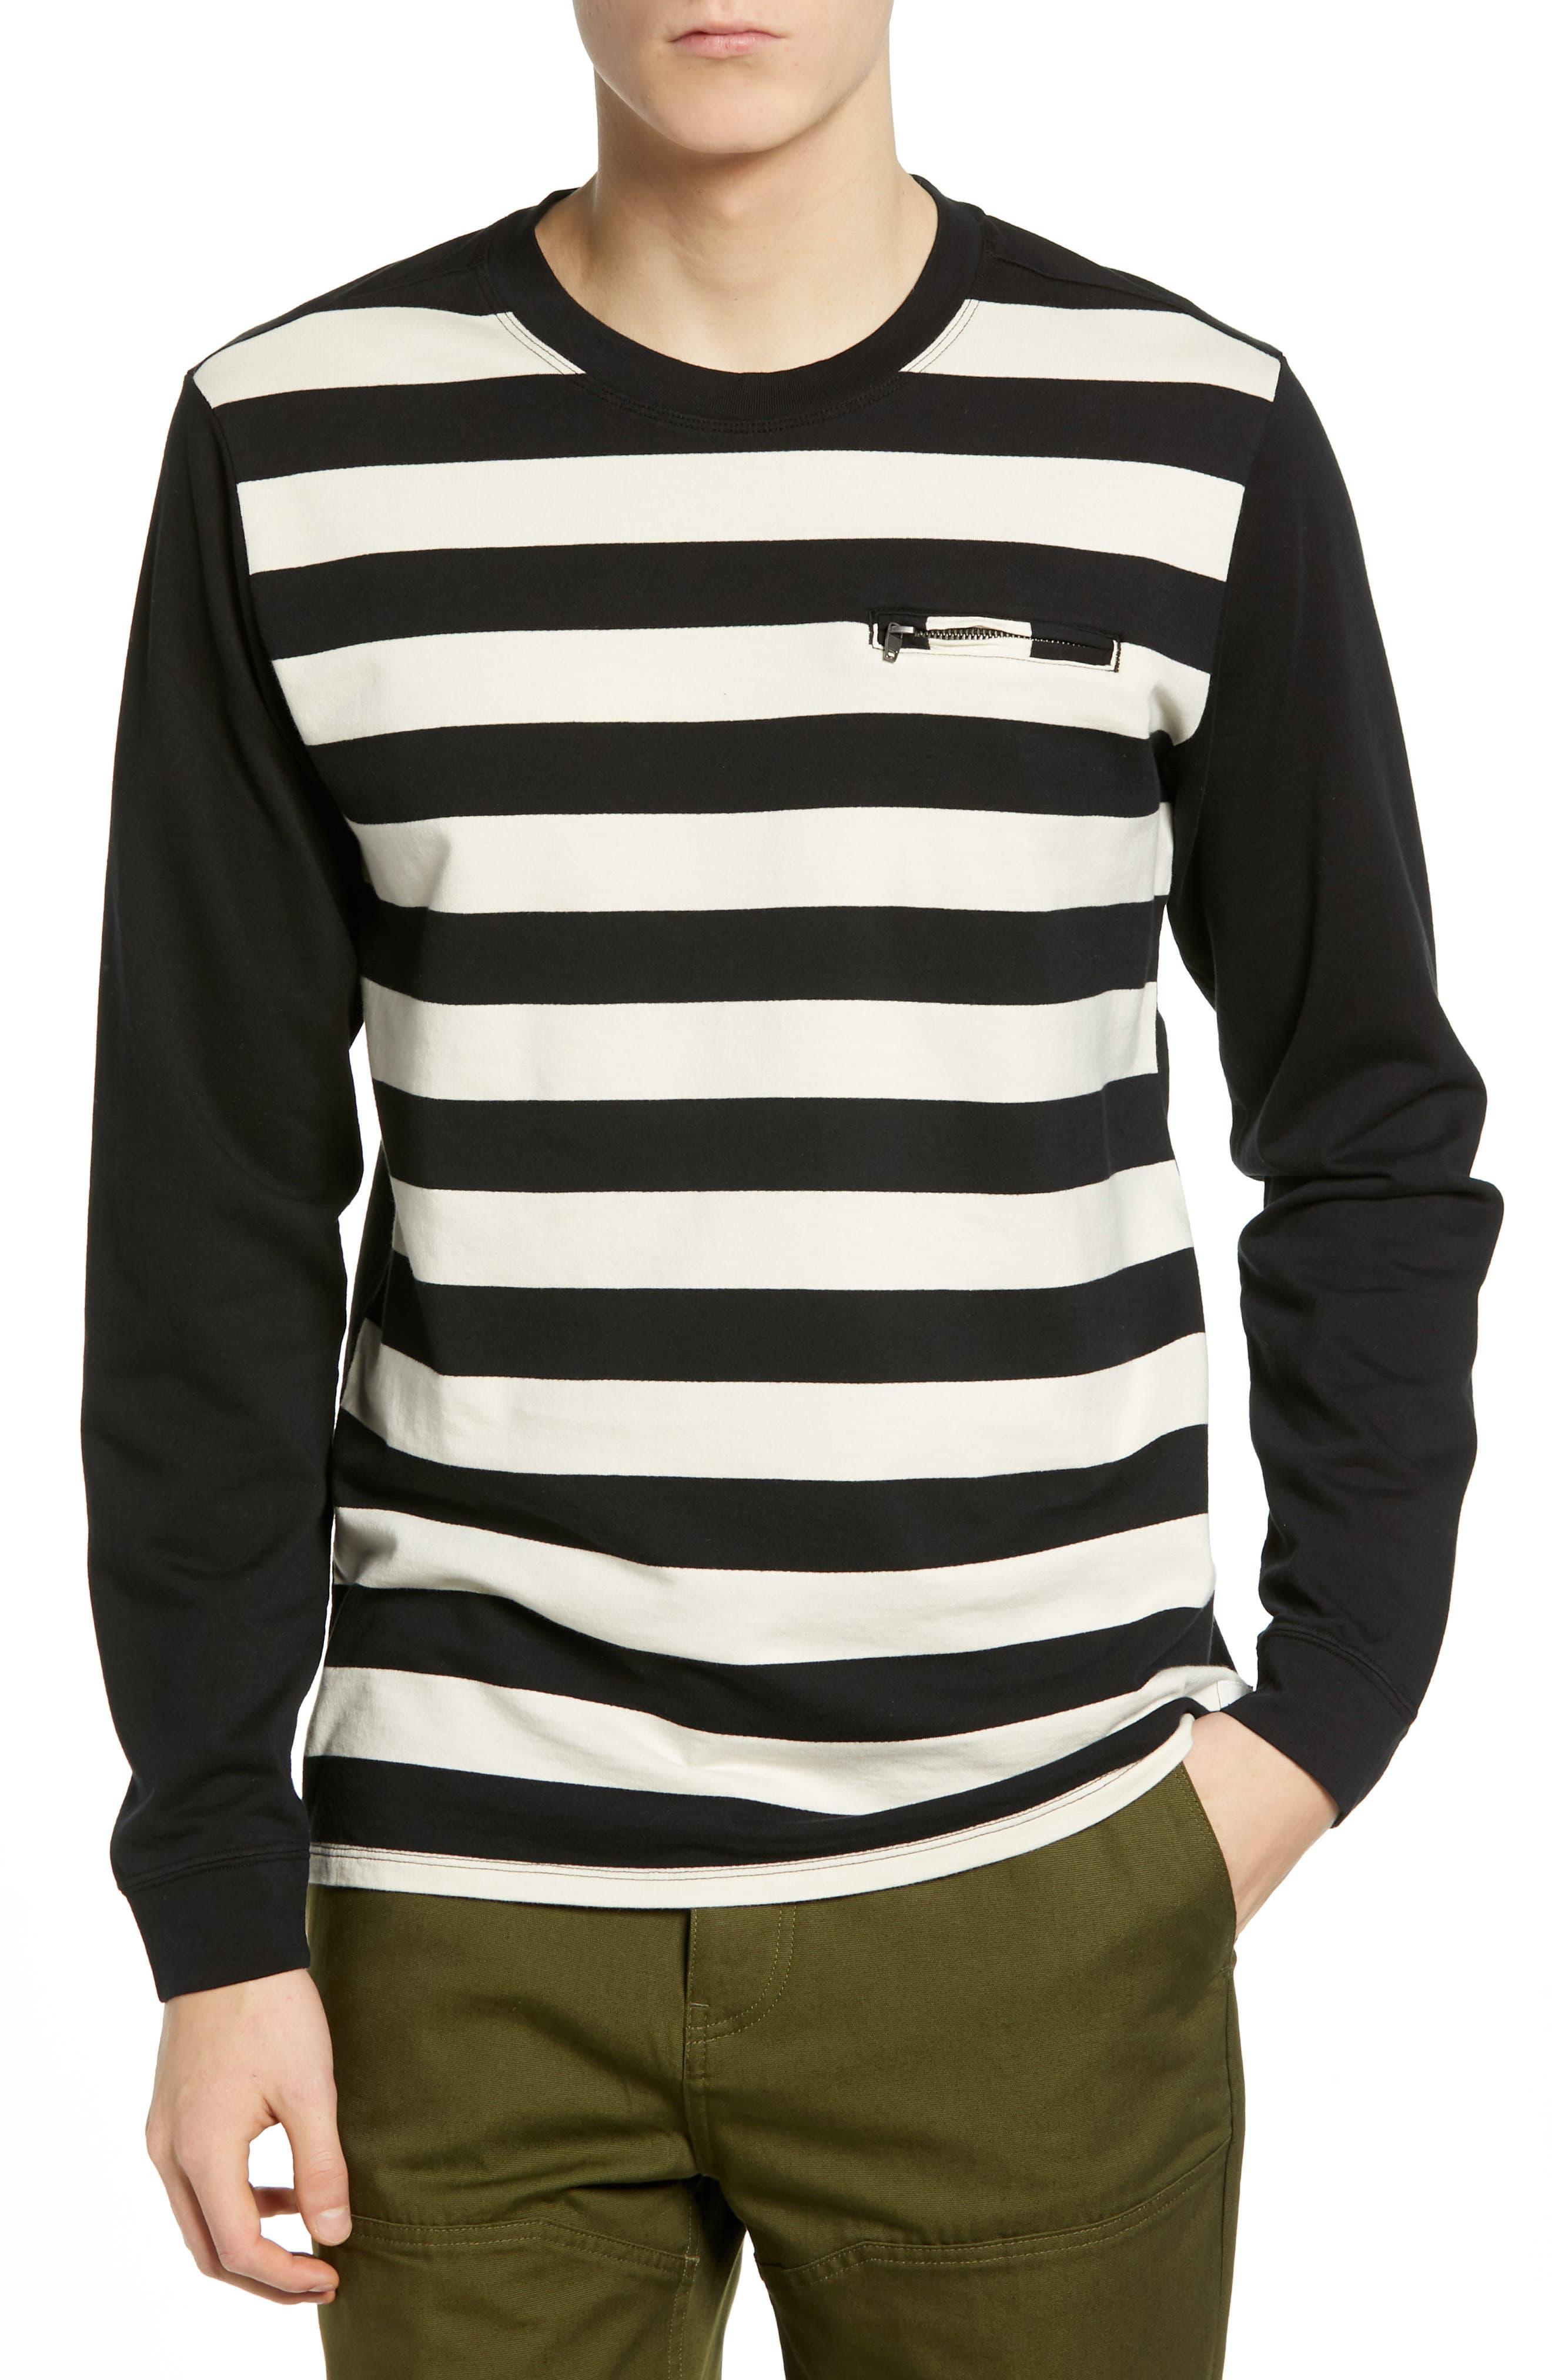 Hurley Moto Striped Long Sleeve T-Shirt, Black